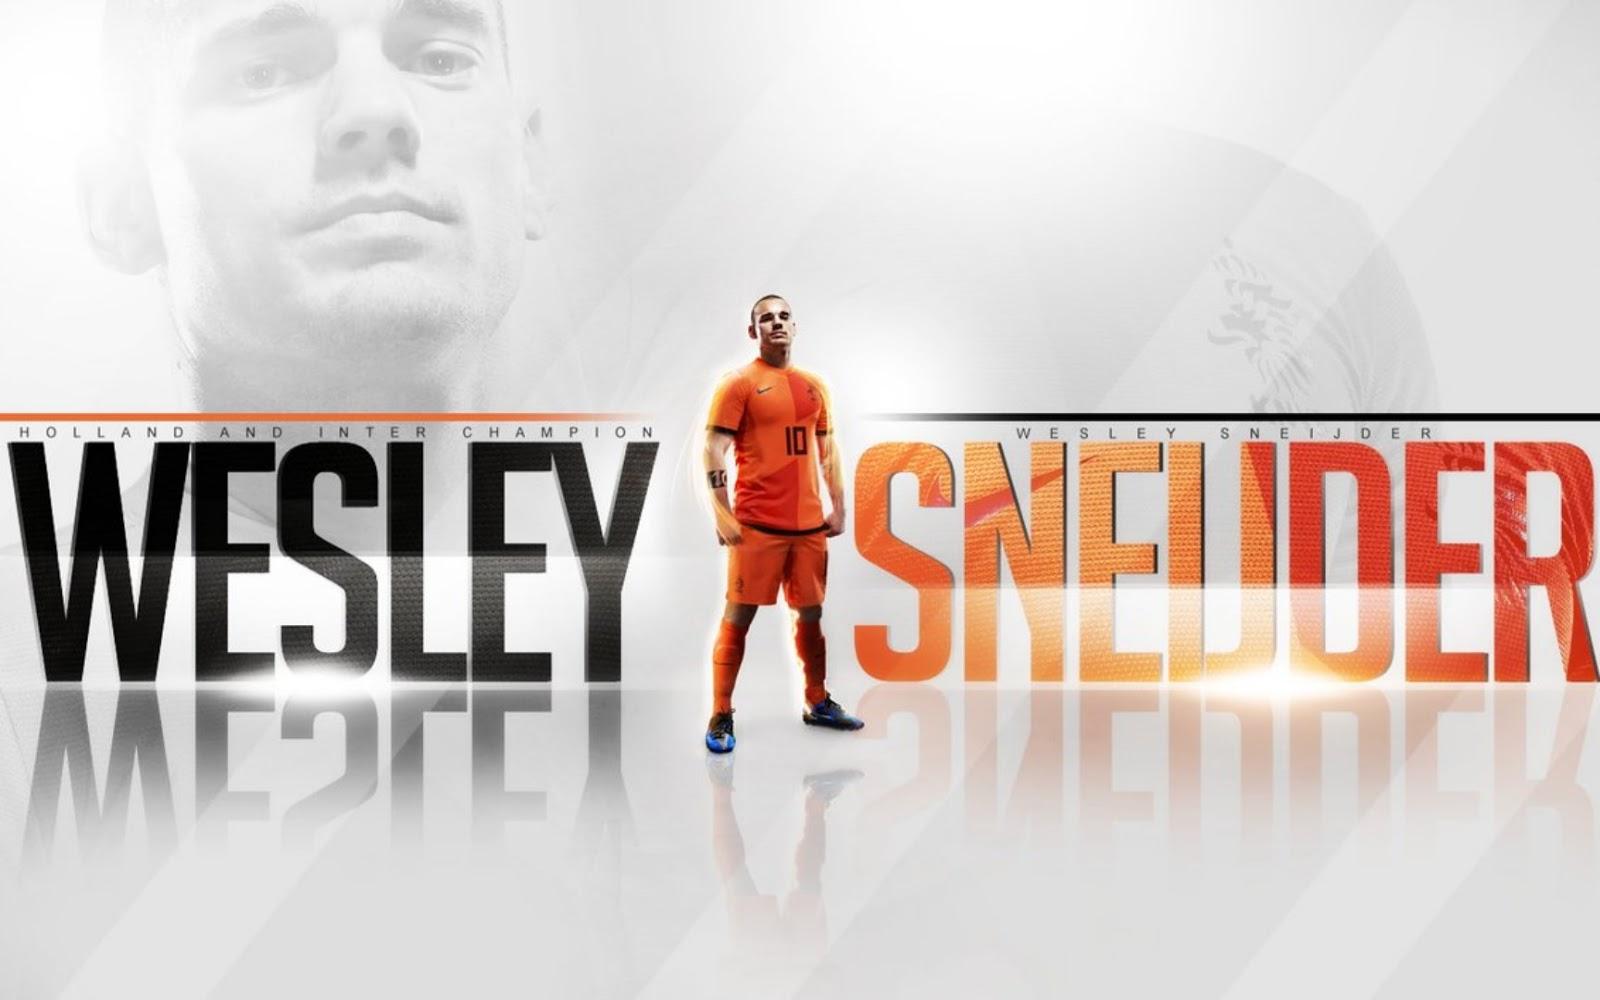 wesley+sneijder+galatasaray+resimleri+rooteto+18 Wesley Sneijder Galatasaray HD Resimleri